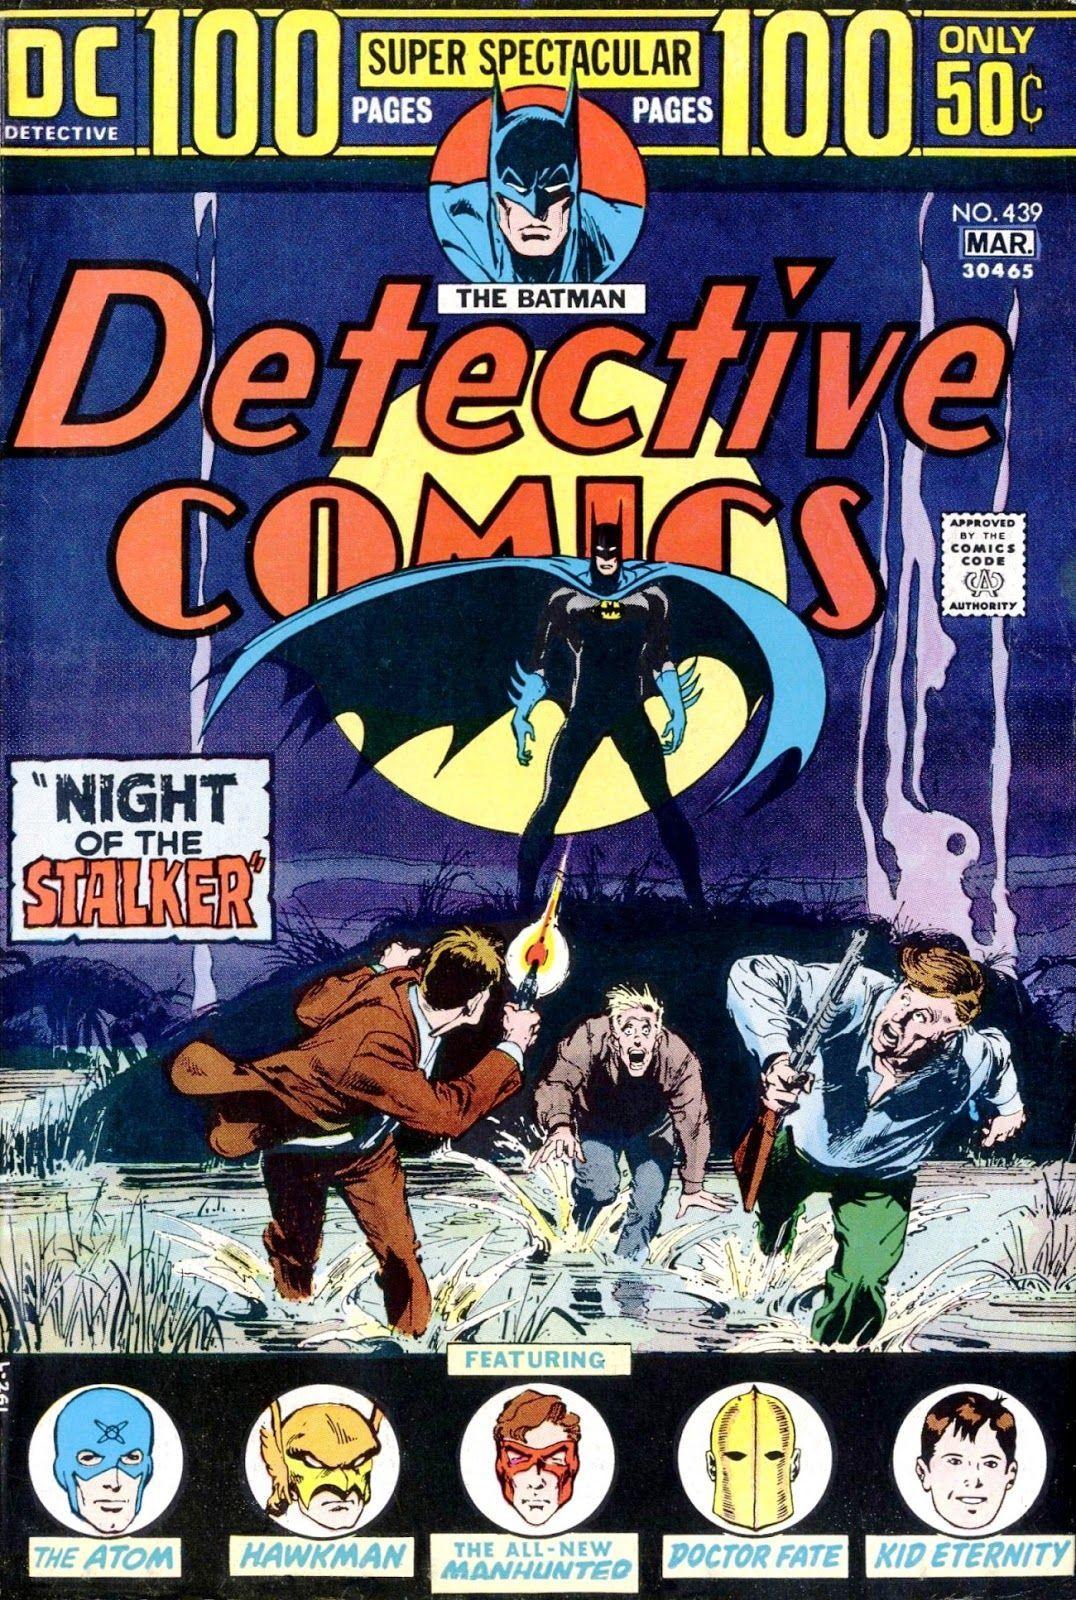 Detective Comics #439 (Writer: Steve Englehart, Plot and Pencils: Vin & Sal Amendola)